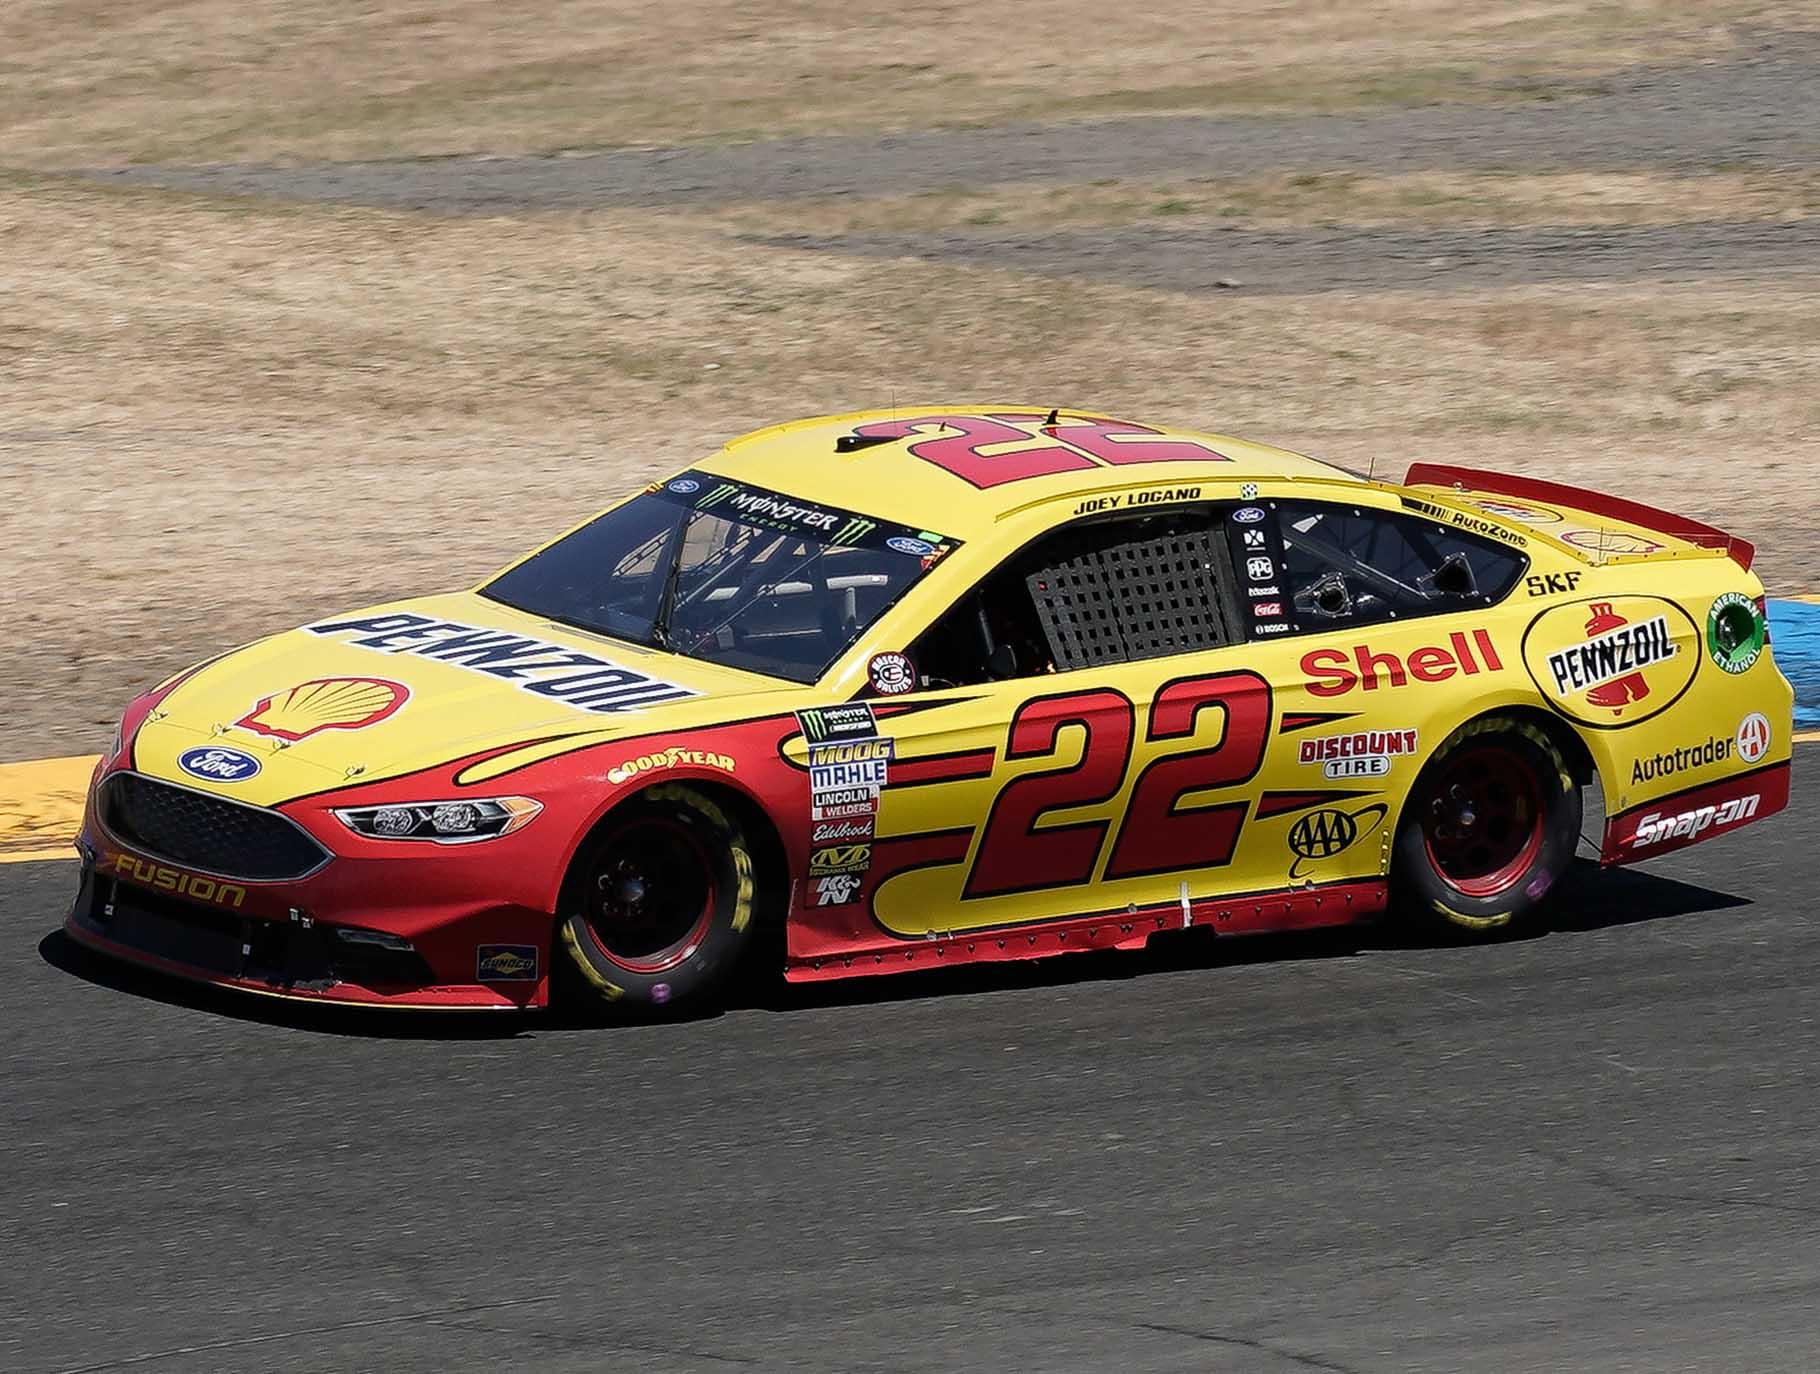 NASCAR: Toyota / Save Mart 350